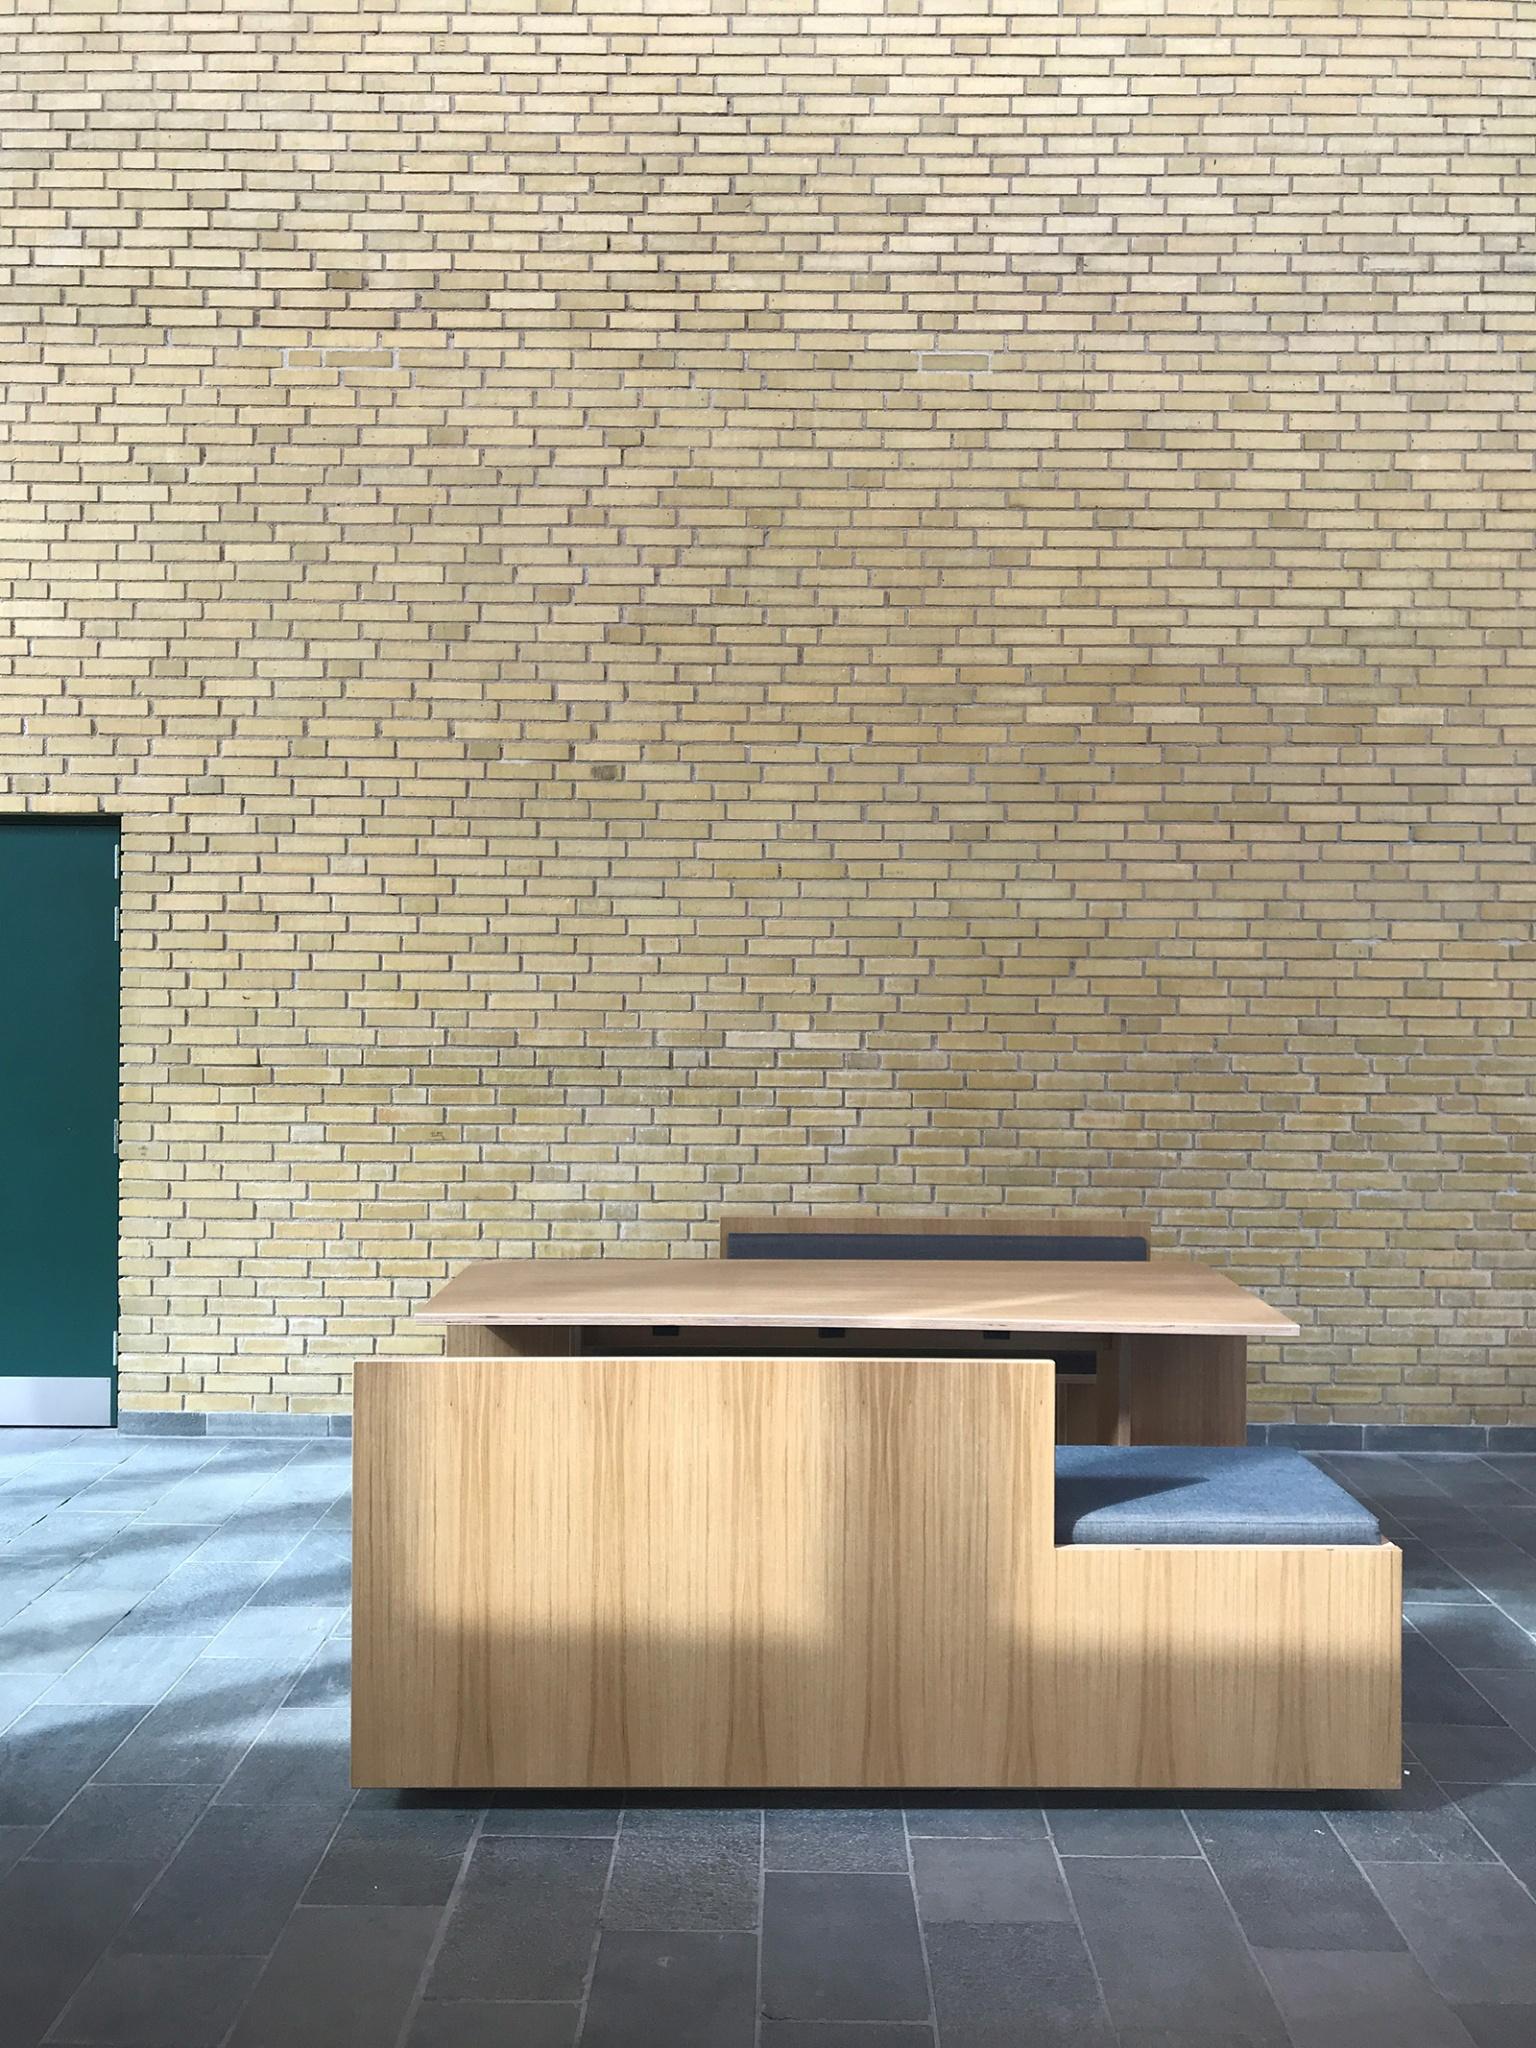 116_møbler og materialer_foto Line Juul Greisen